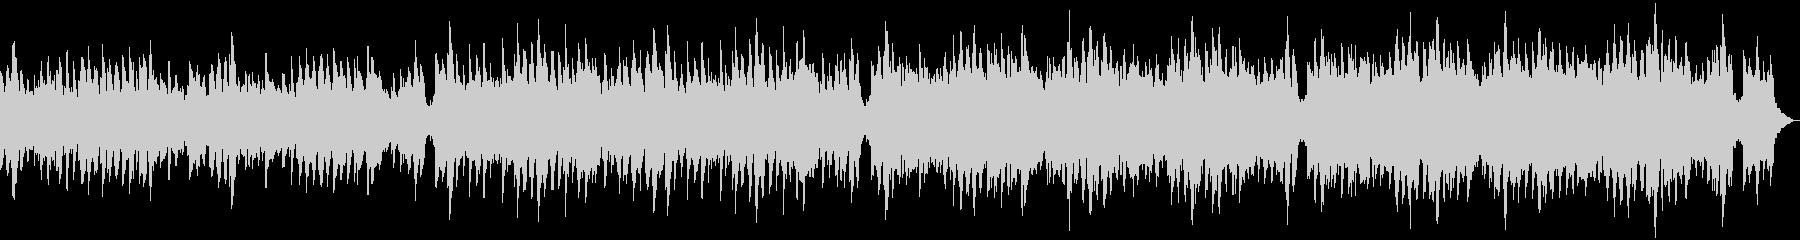 Piano Arpeggiosの未再生の波形